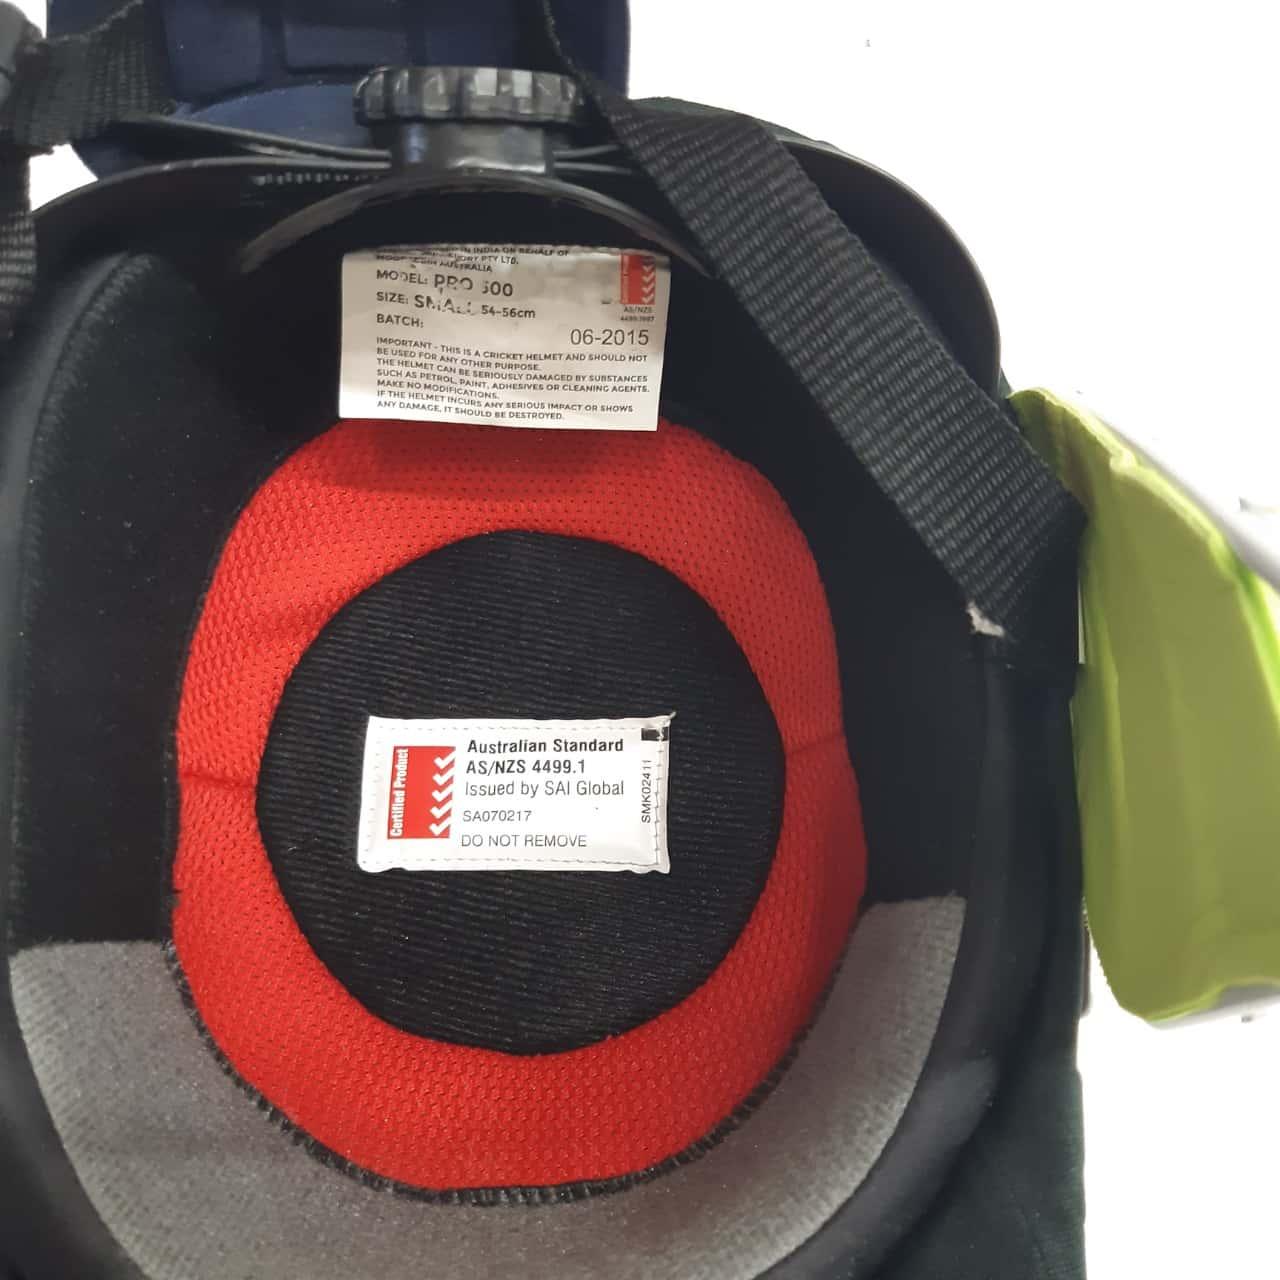 *REDUCED*- Kookaburra Cricket Helmet